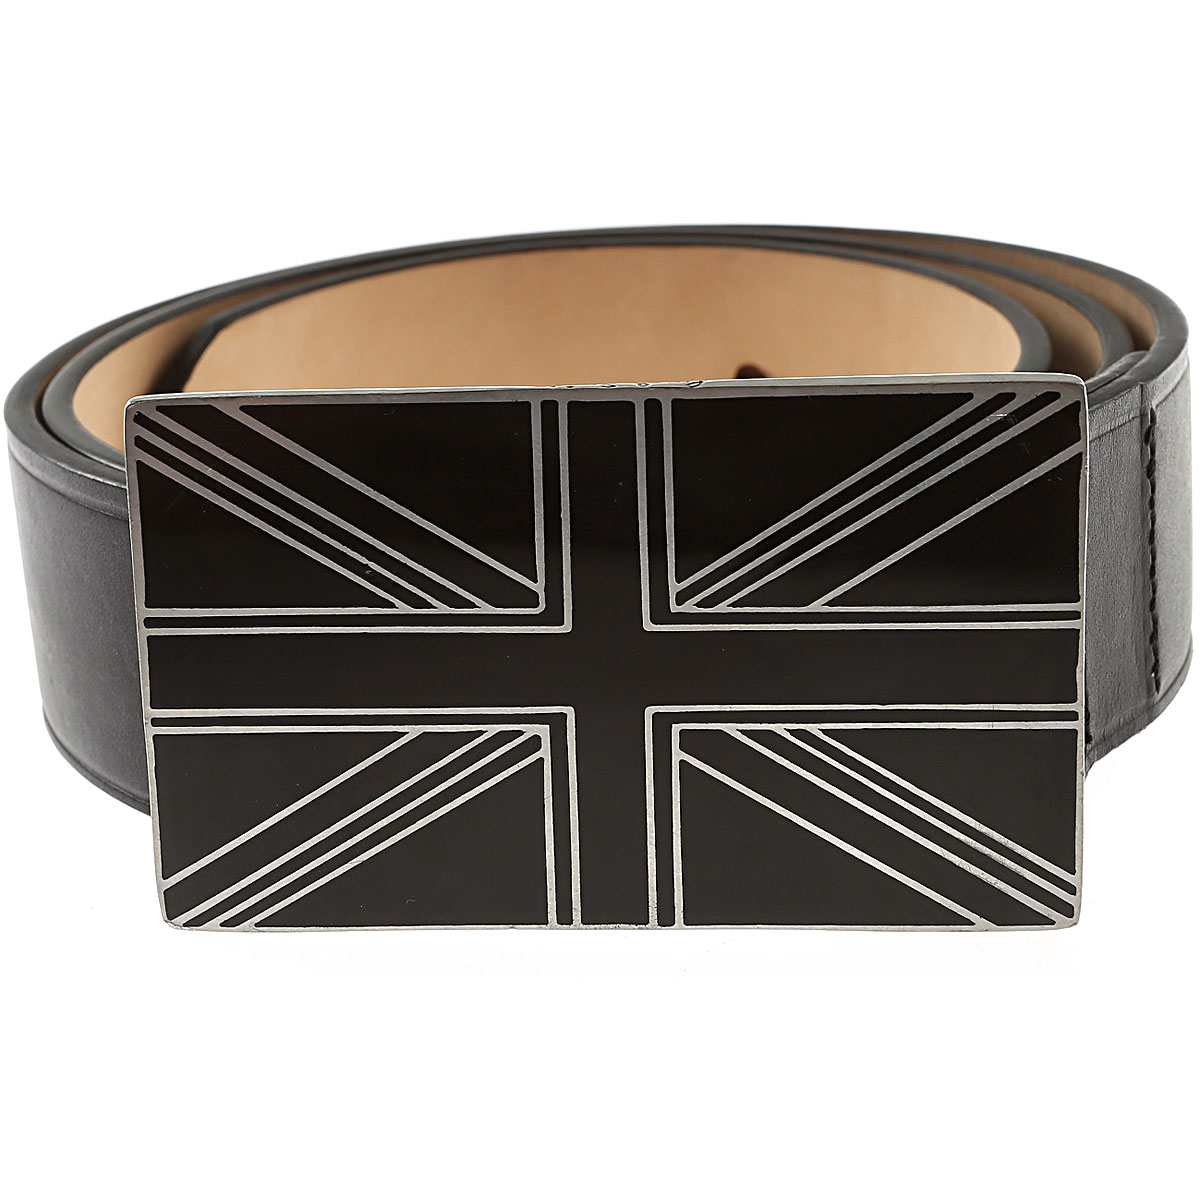 Paul Smith Mens Belts, Black, Leather, 2017, 36 38